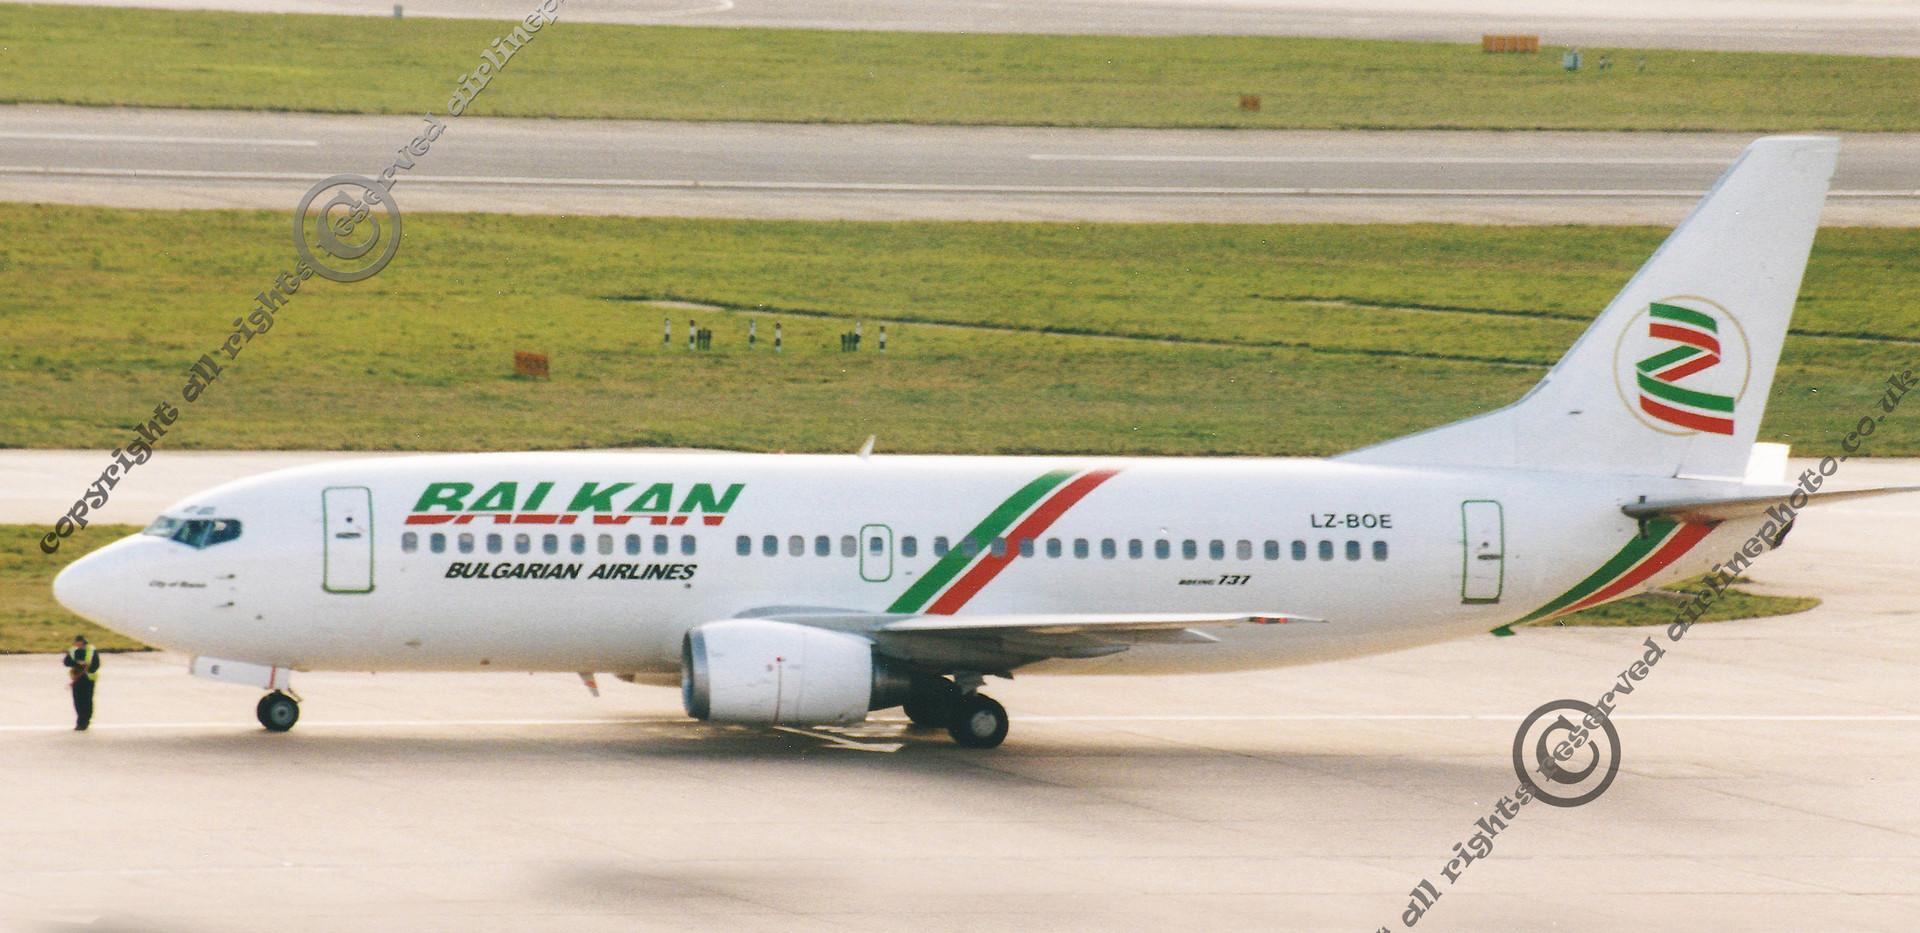 LZ-BOE-Balkan-Bulgarian-Airlines-737.jpg